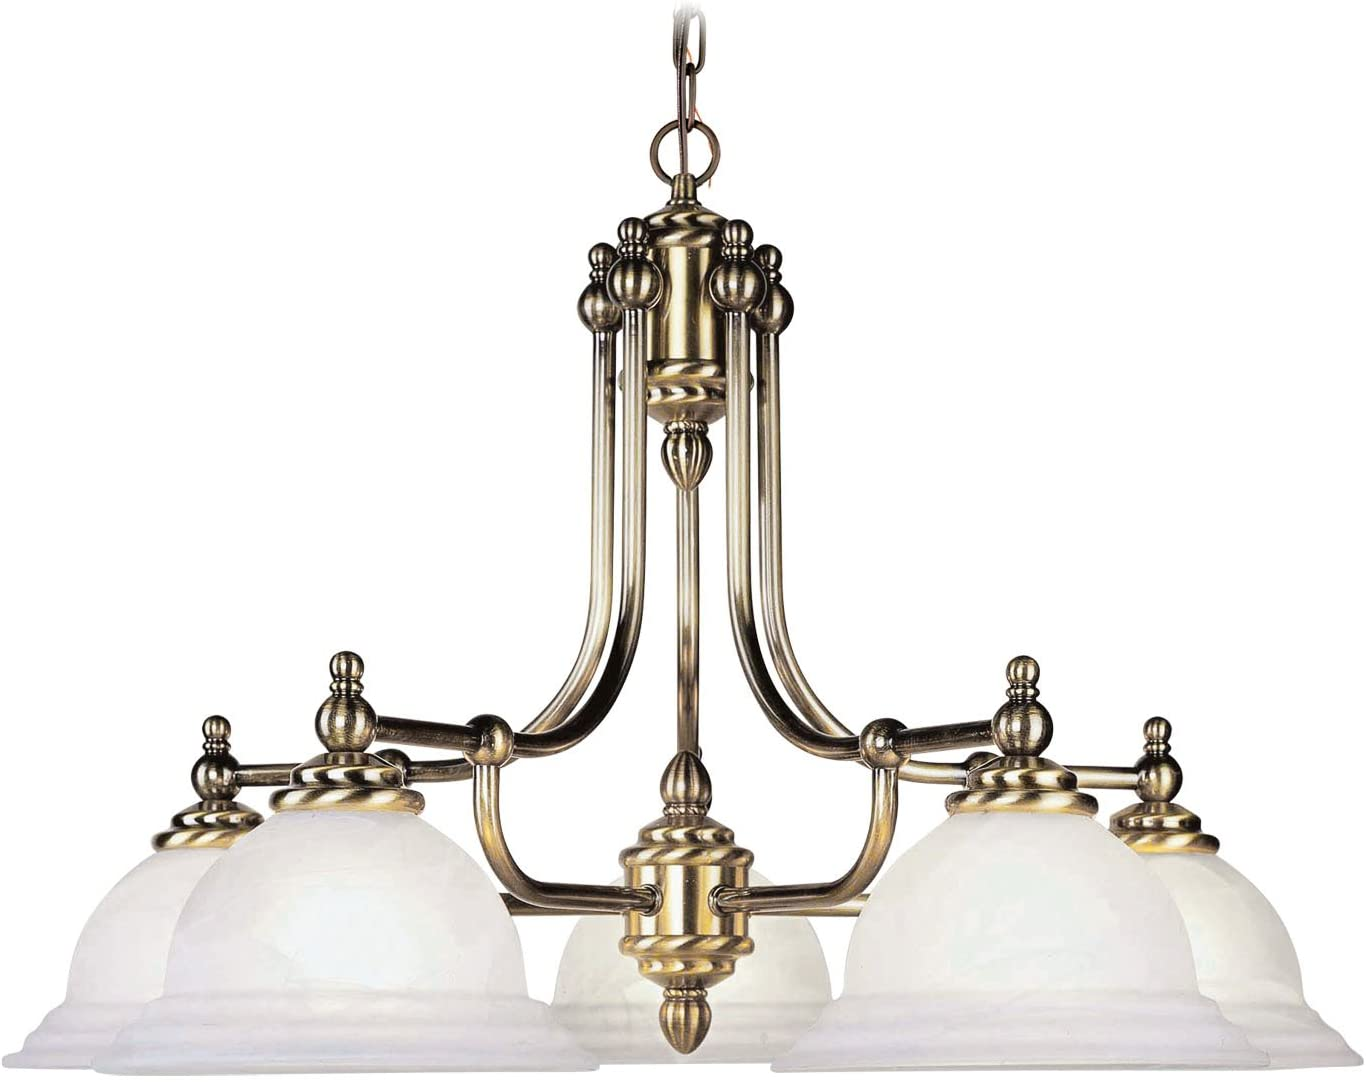 Livex Lighting 4255-01 North Port 5 Light Antique Brass Chandelier